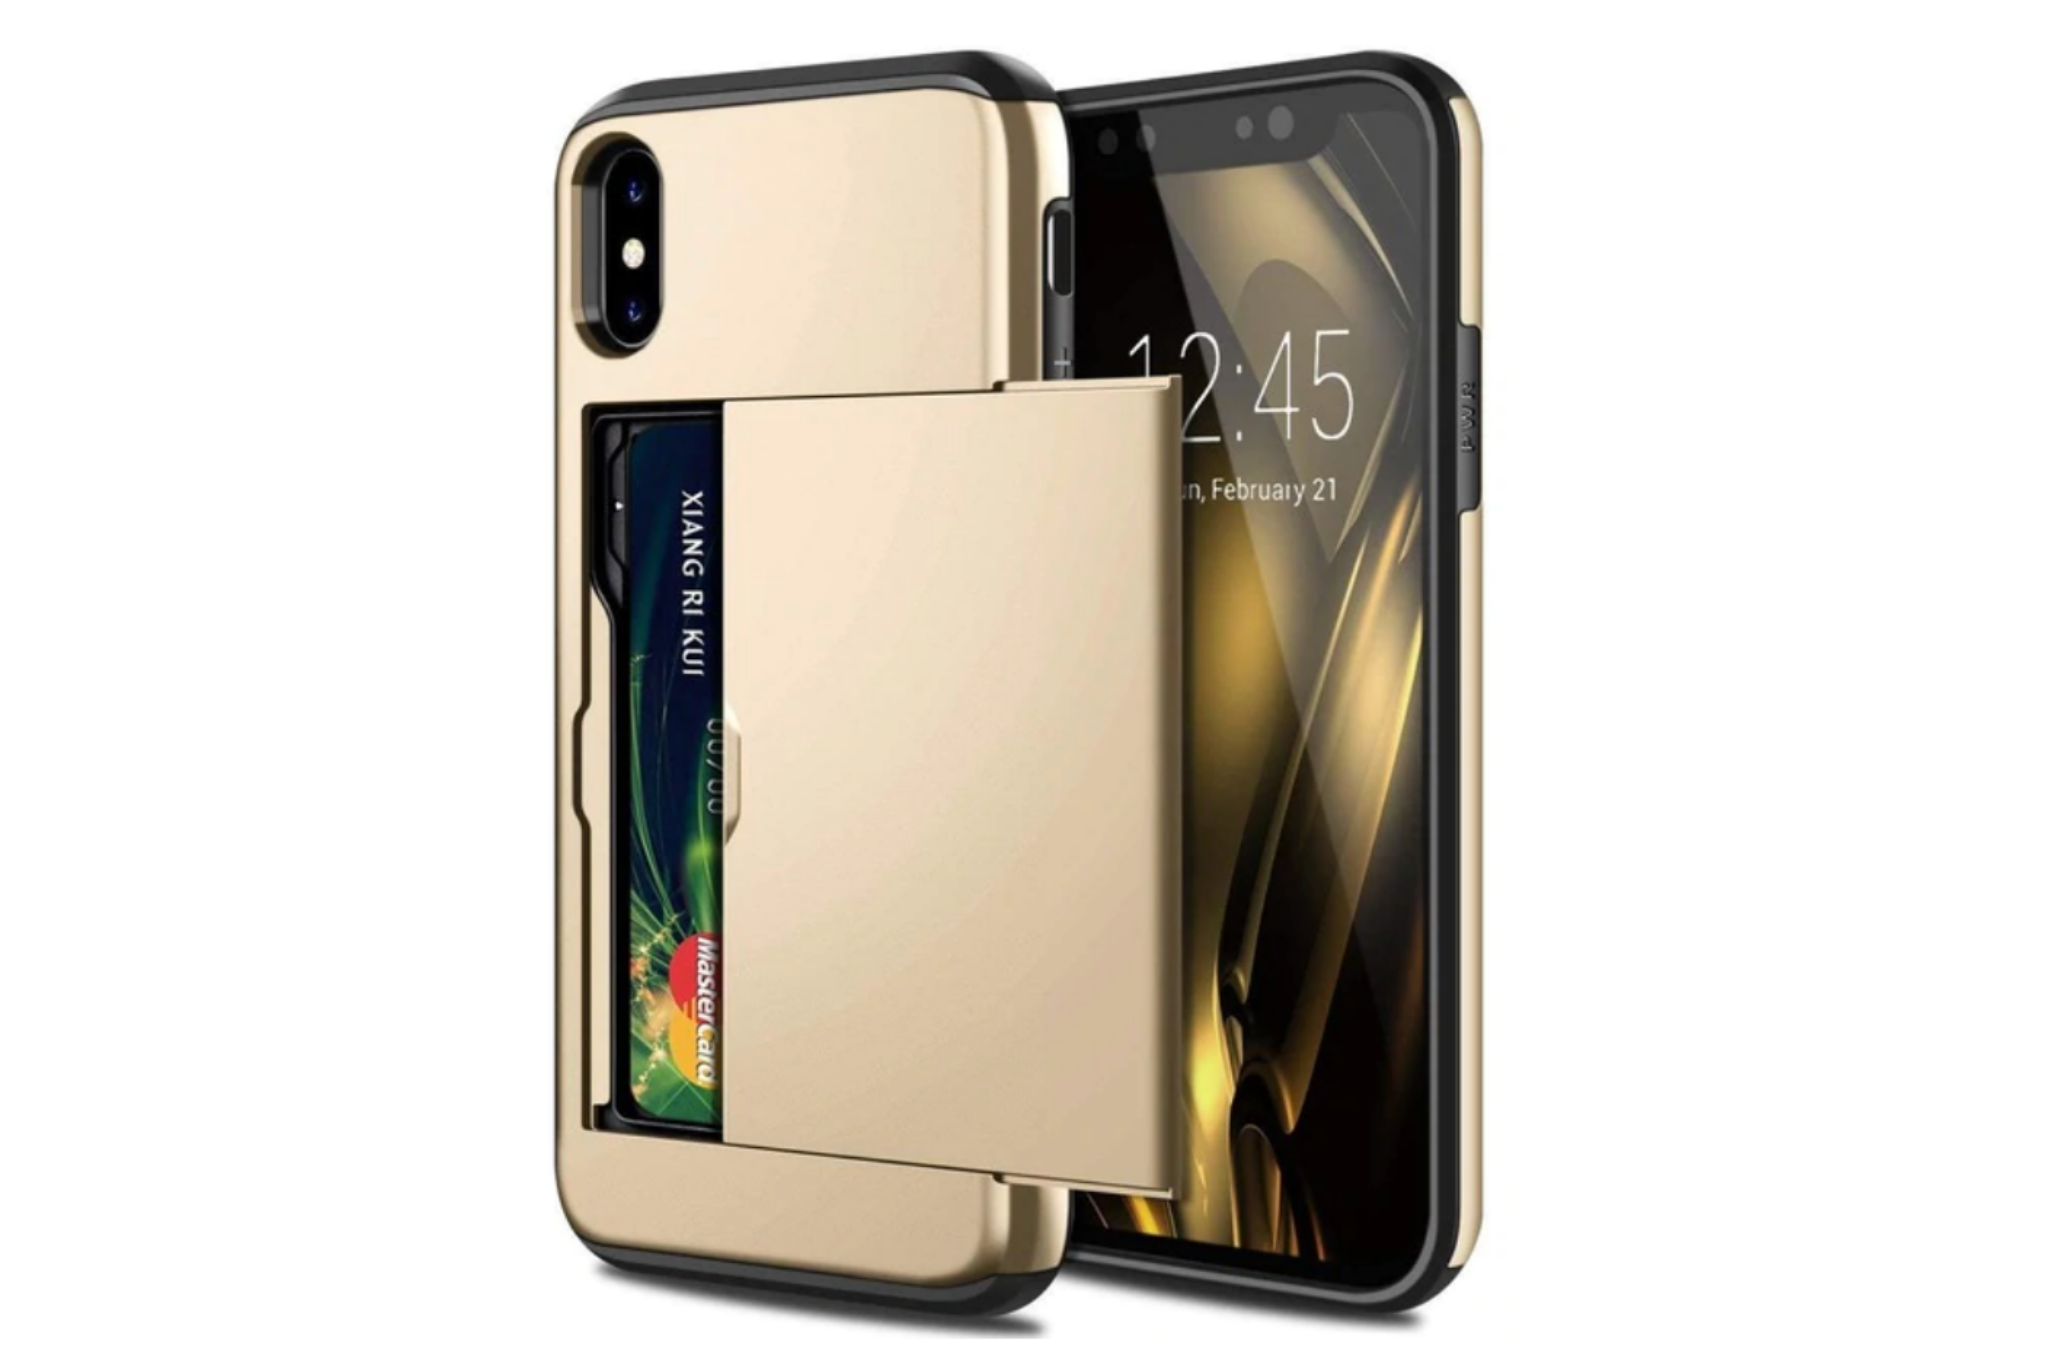 Smartphonehoesje iPhone 7 / 8 Plus | Pasjesschuif gold - Copy